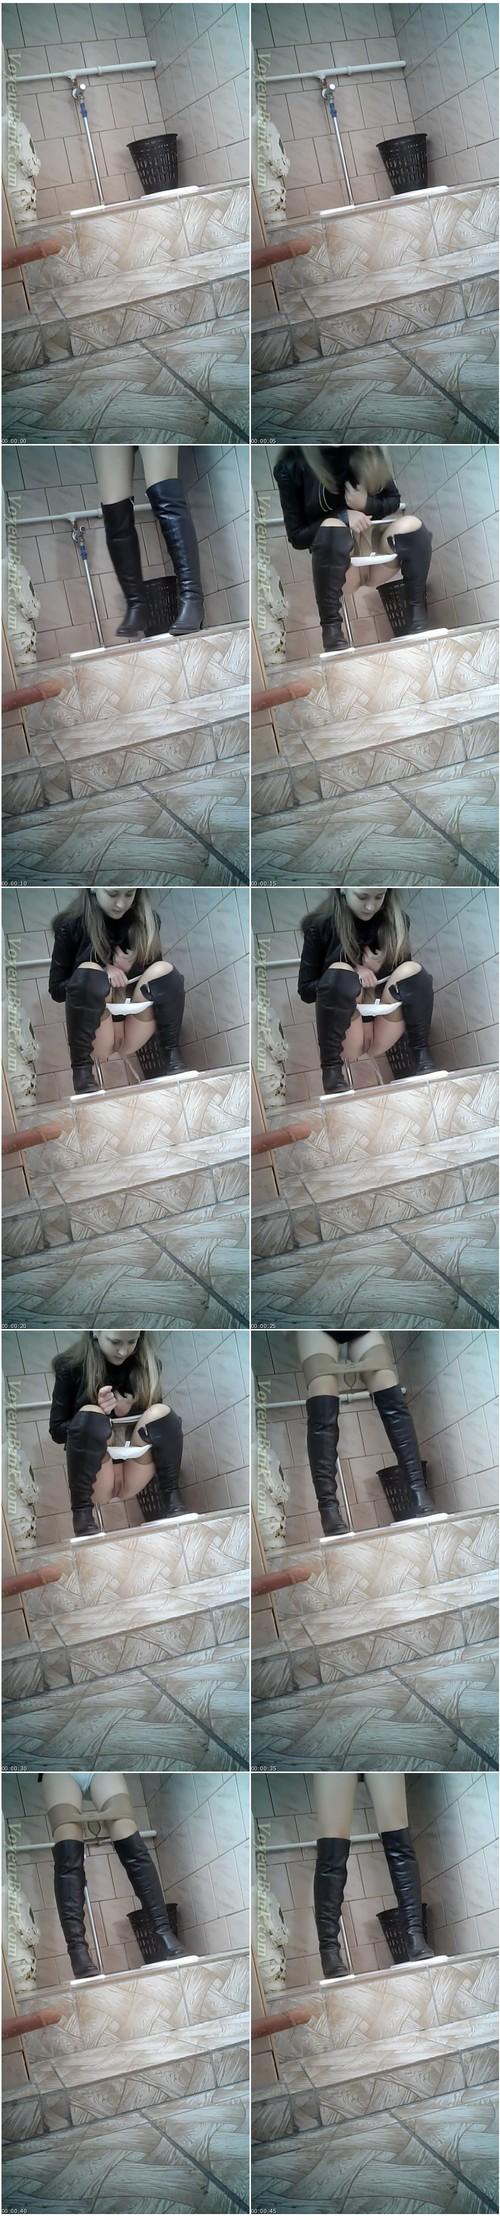 http://ist5-1.filesor.com/pimpandhost.com/9/6/8/3/96838/6/j/f/D/6jfDM/VoyeurBank0531_thumb_m.jpg